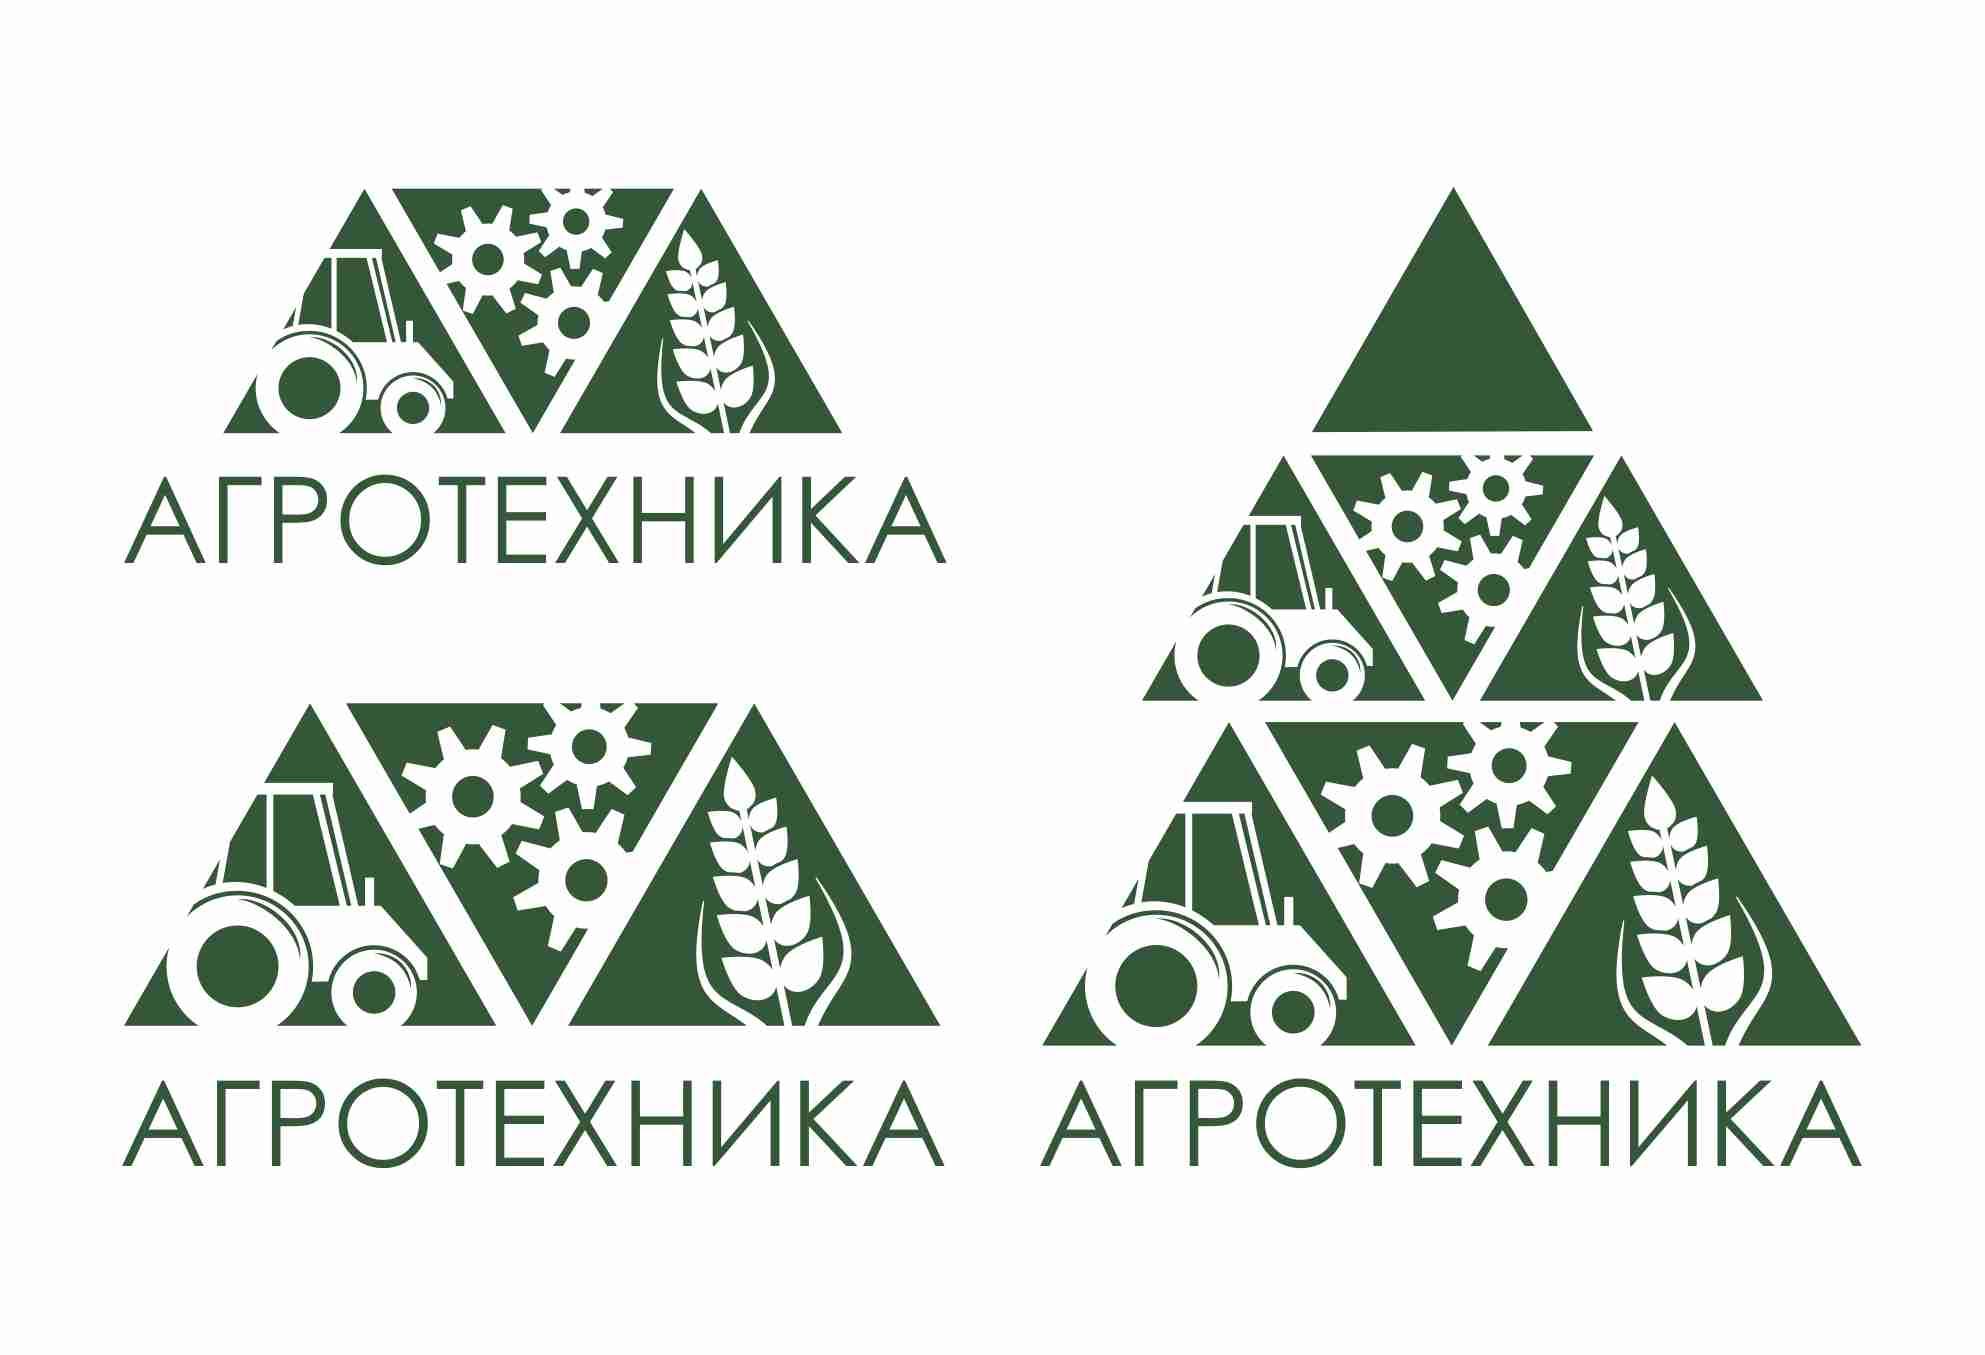 Разработка логотипа для компании Агротехника фото f_7145bff79fa171d3.jpg